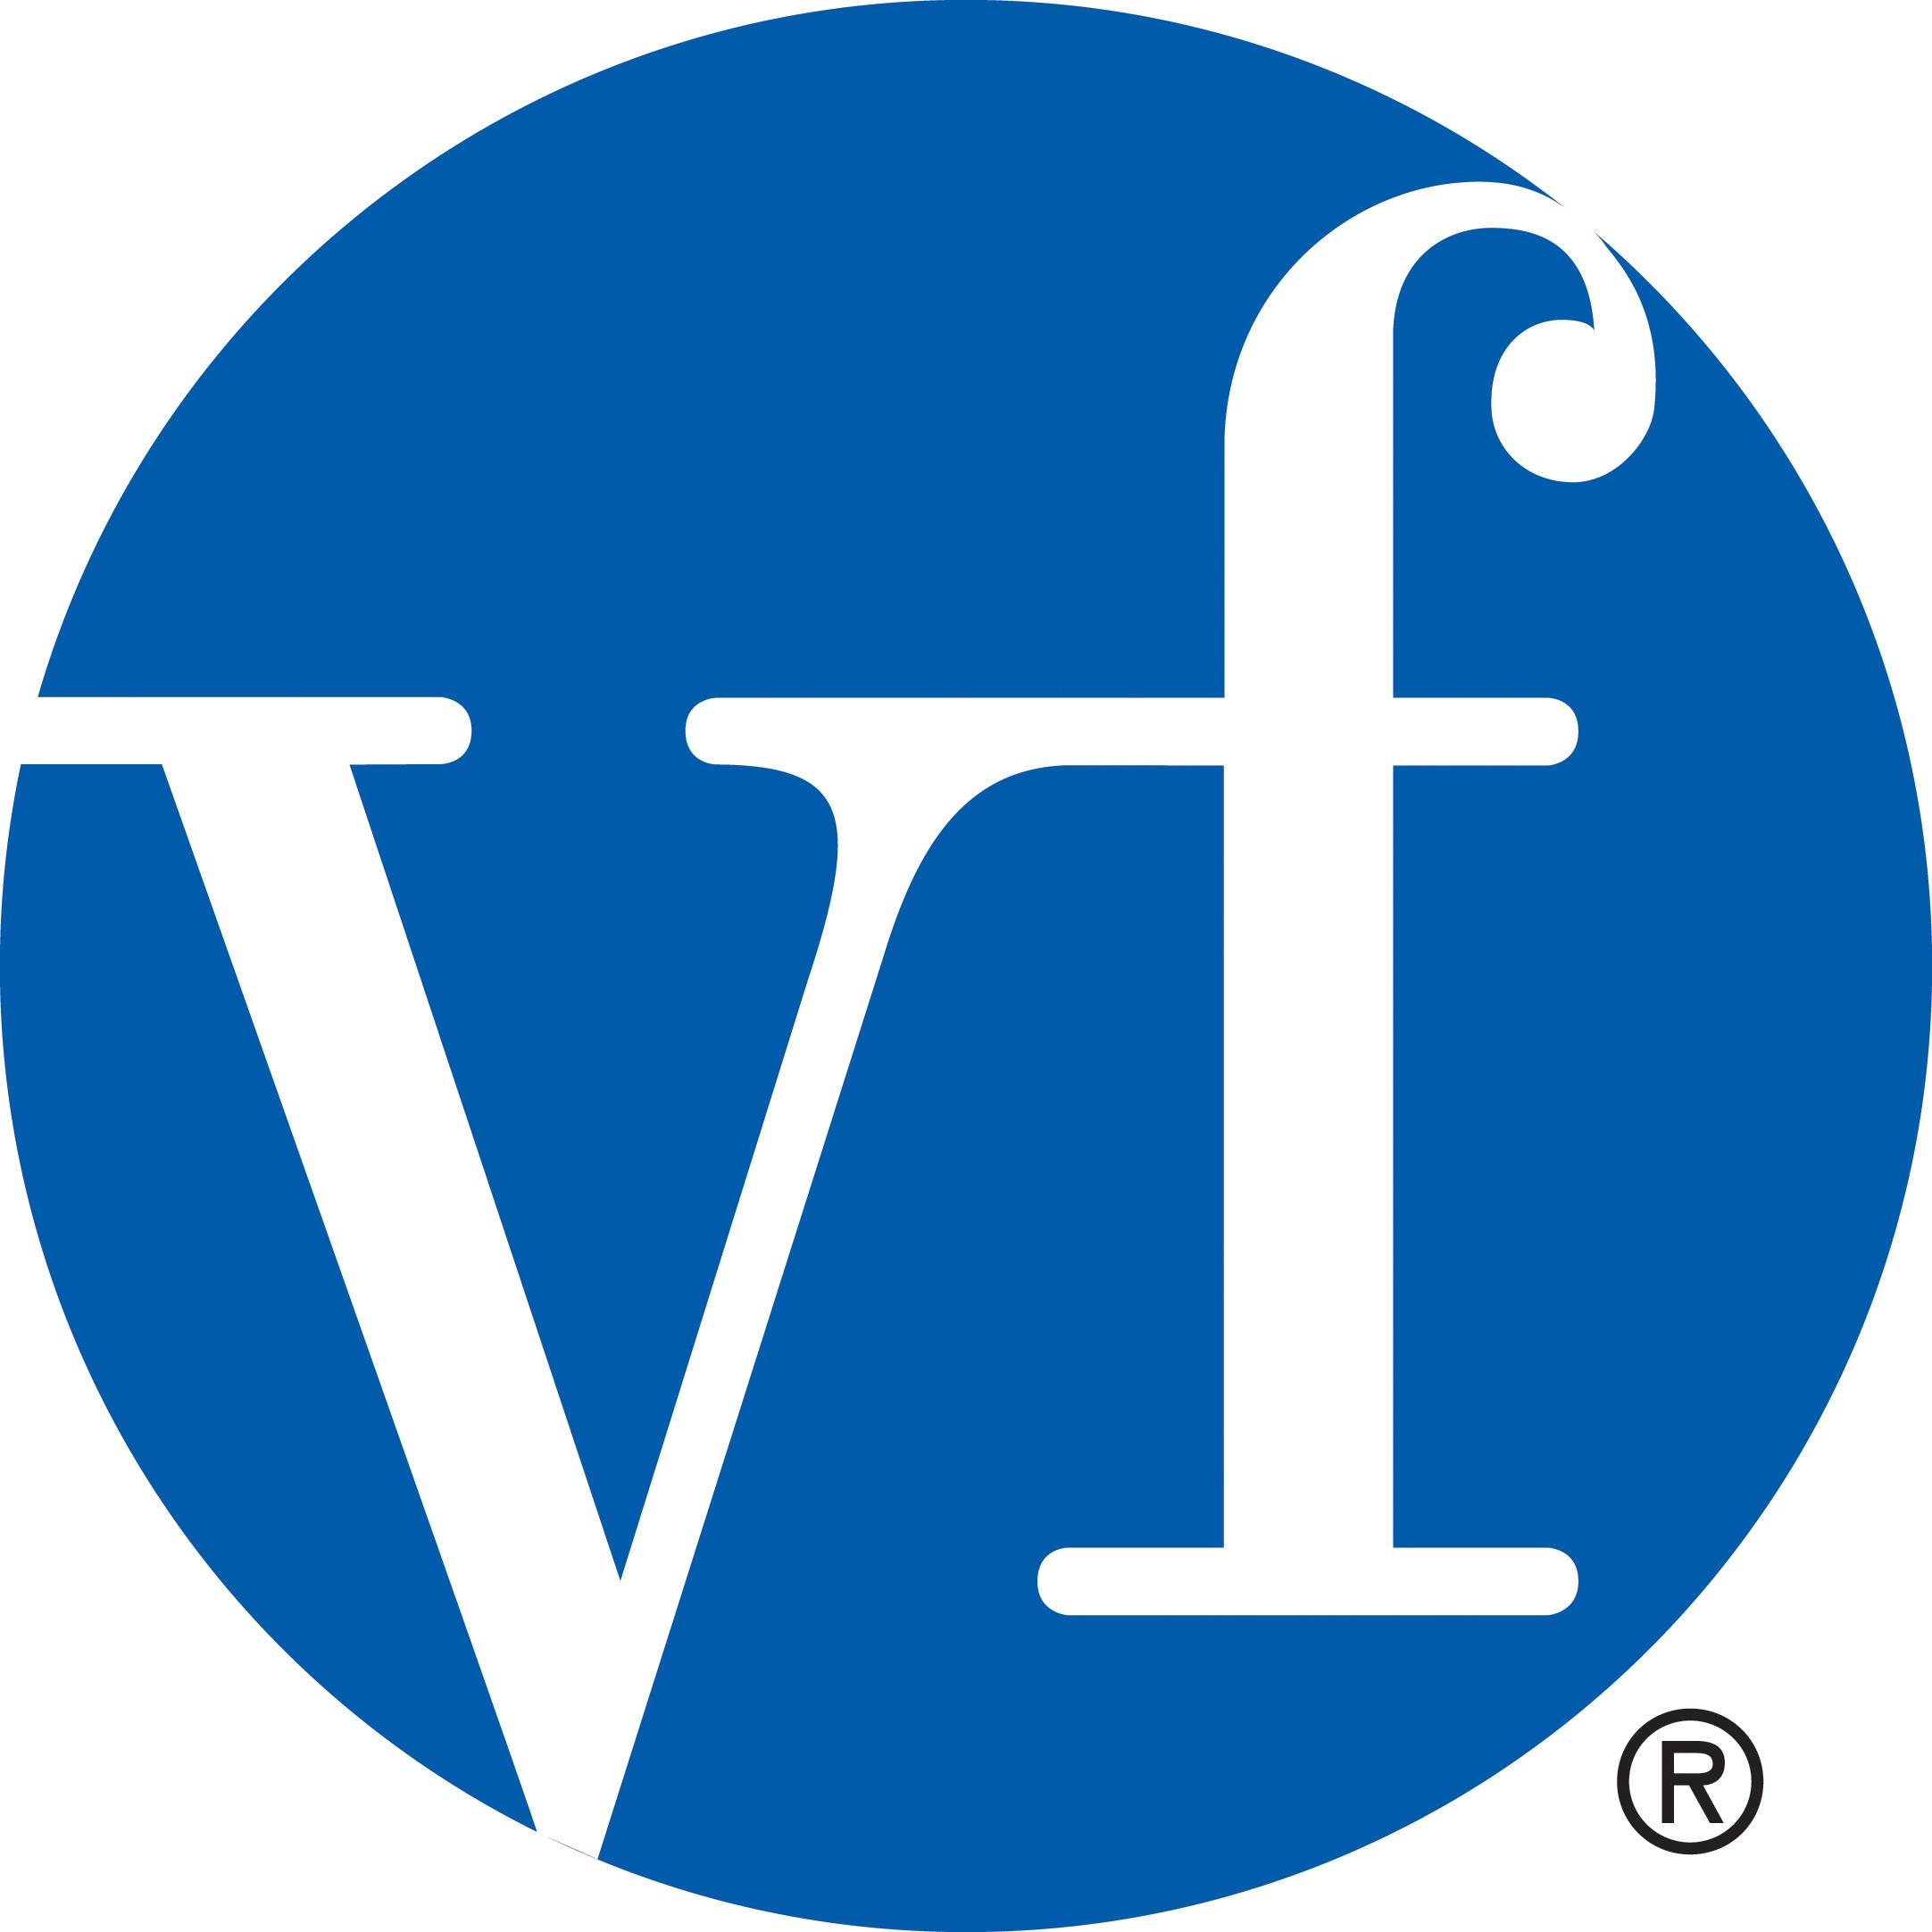 Vans owner VF Corp quarterly revenue beats estimates